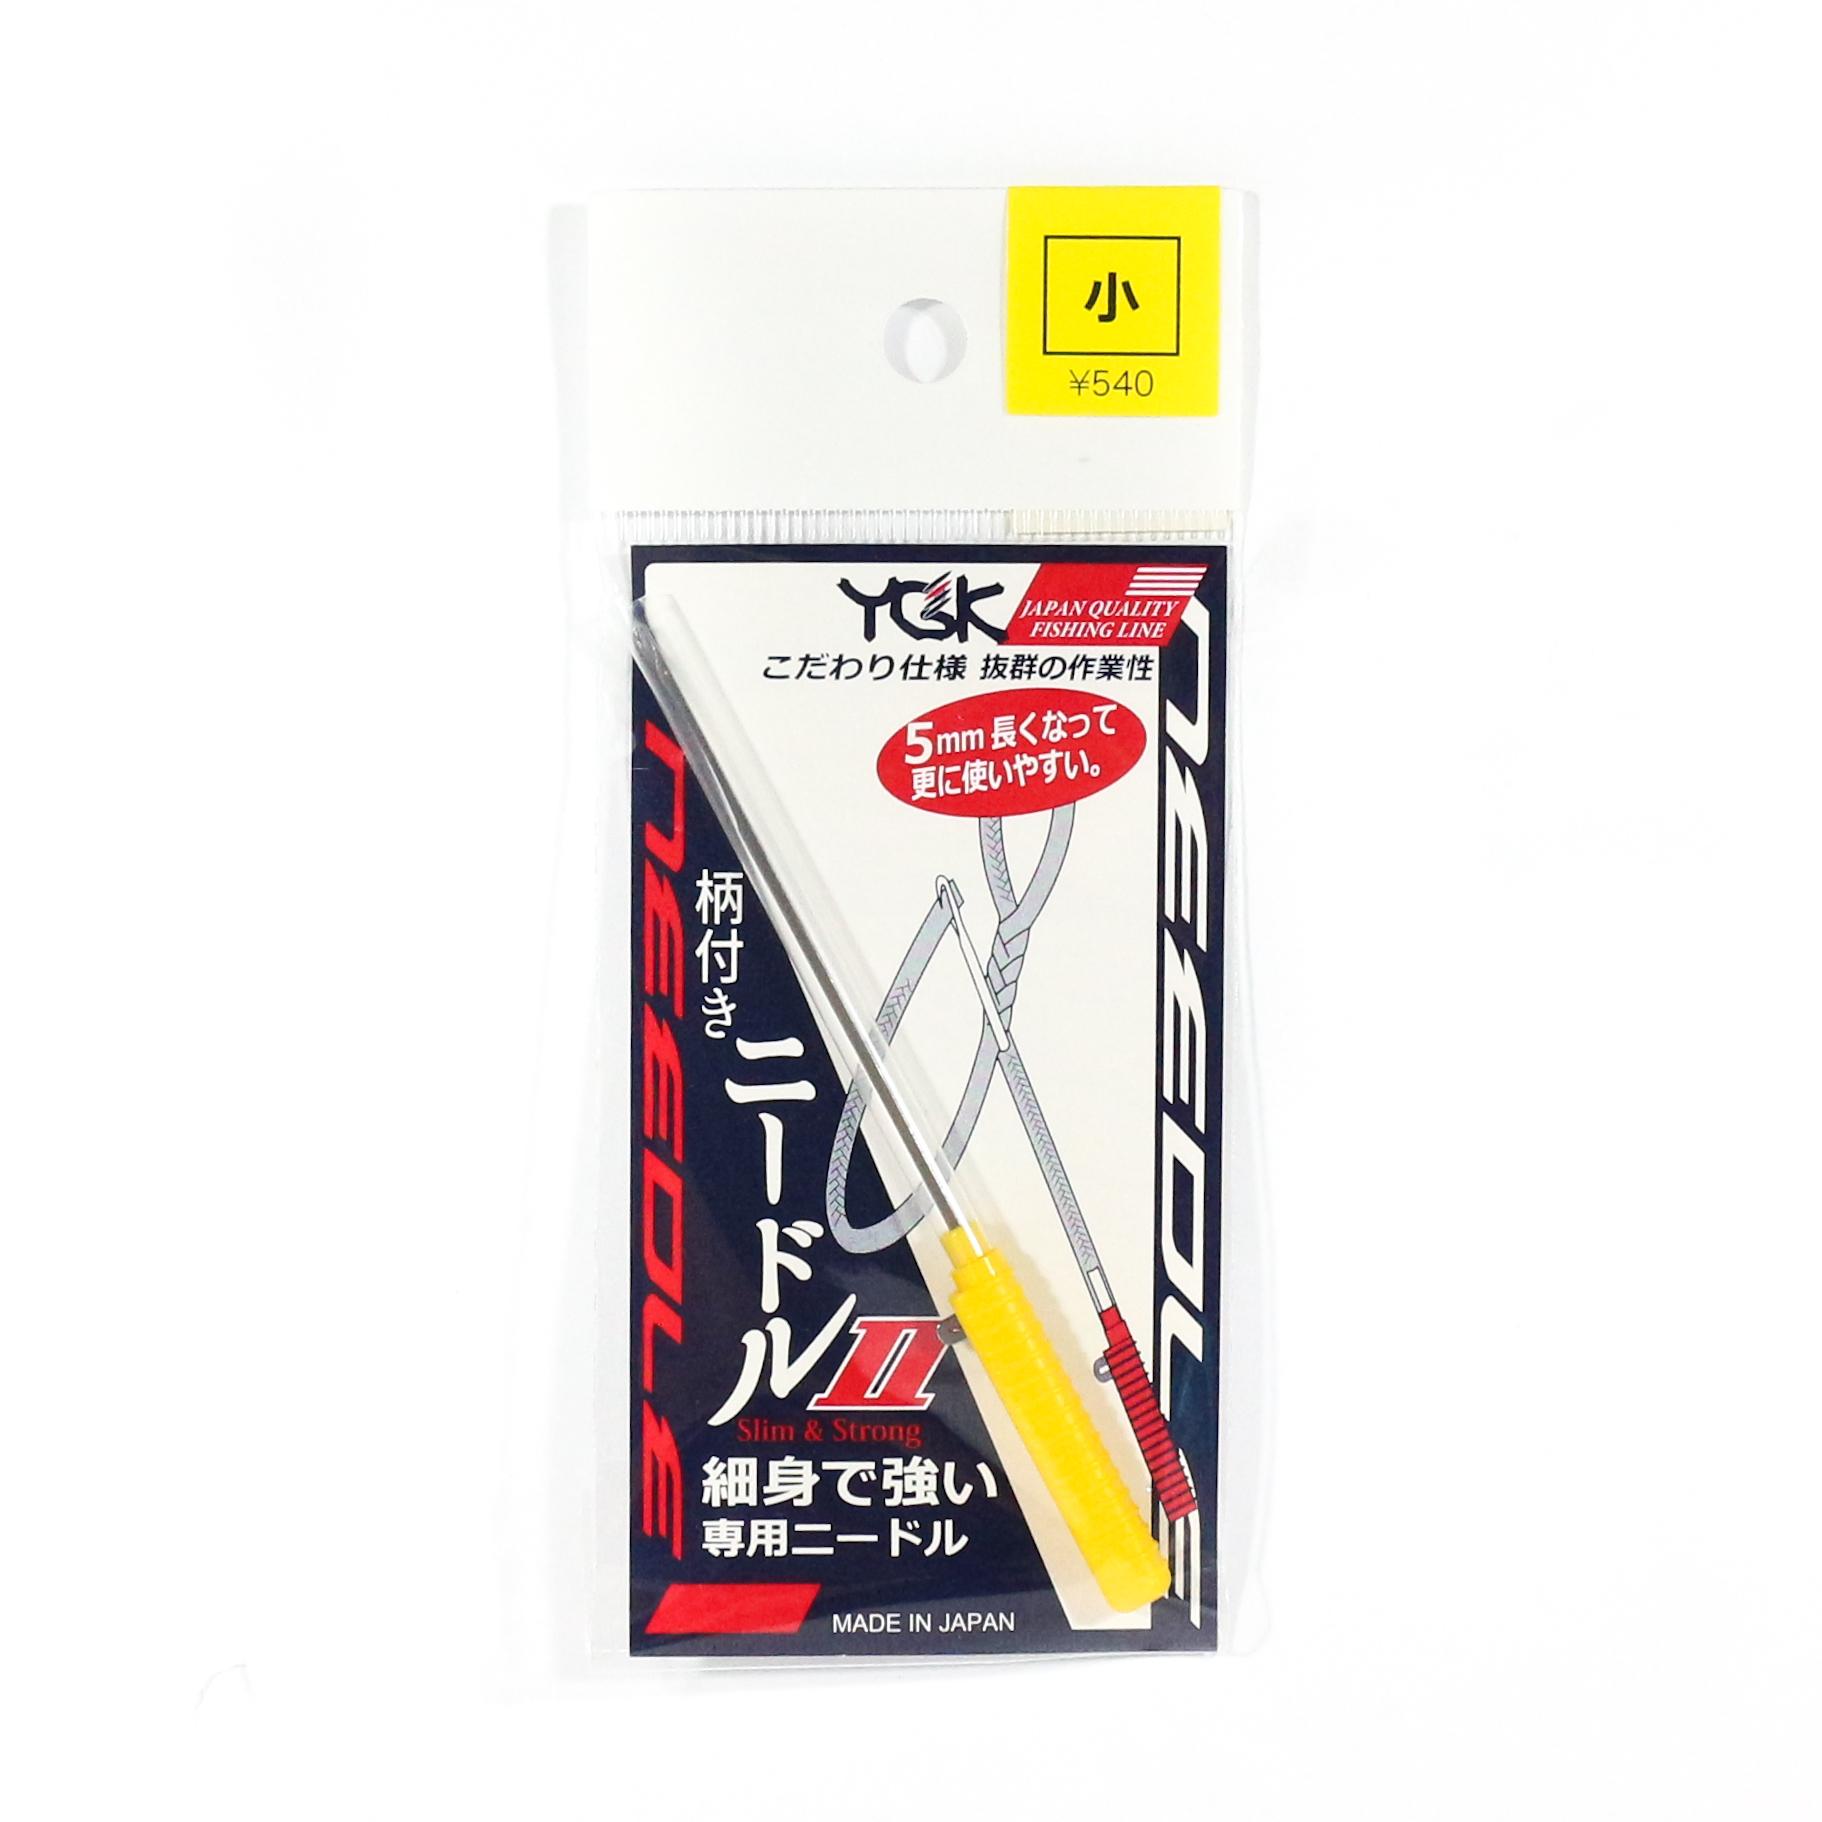 YGK Etsuki Assist Hook Splicing Needle Size S No. 15 above Yellow (2233)